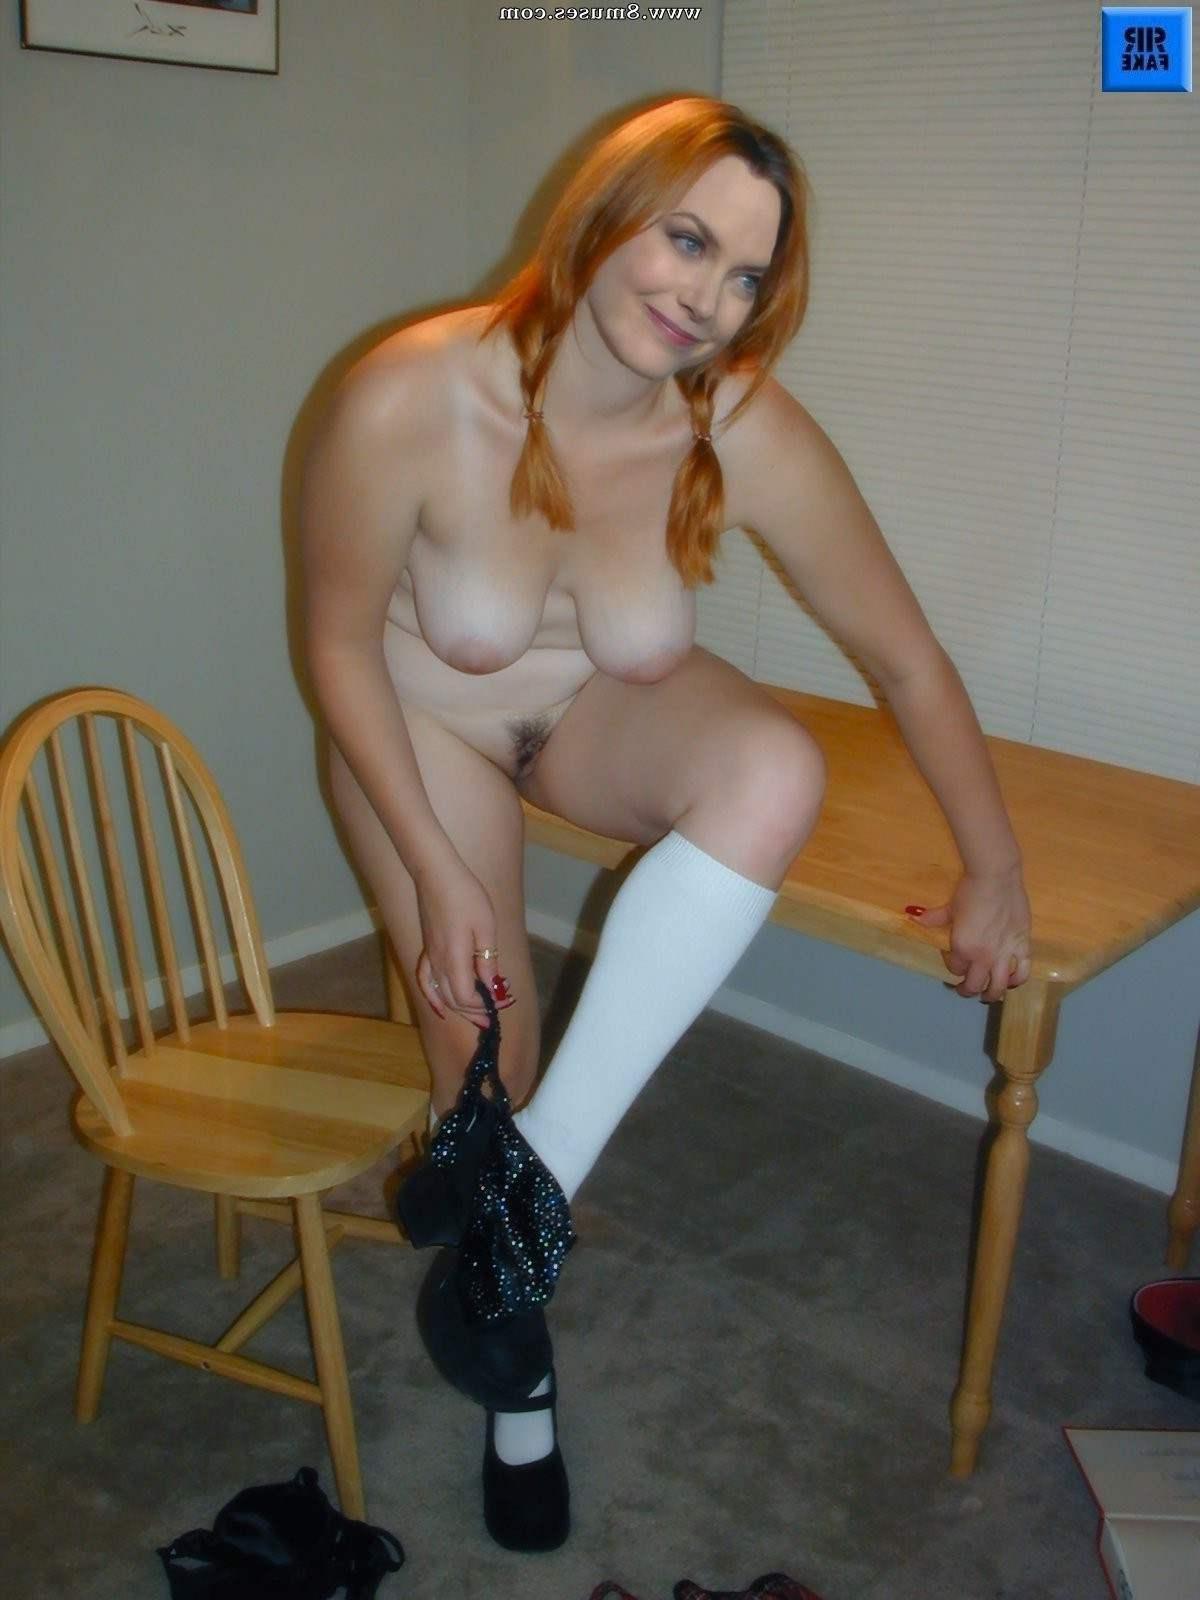 Fake-Celebrities-Sex-Pictures/Nicole-Kidman Nicole_Kidman__8muses_-_Sex_and_Porn_Comics_1011.jpg